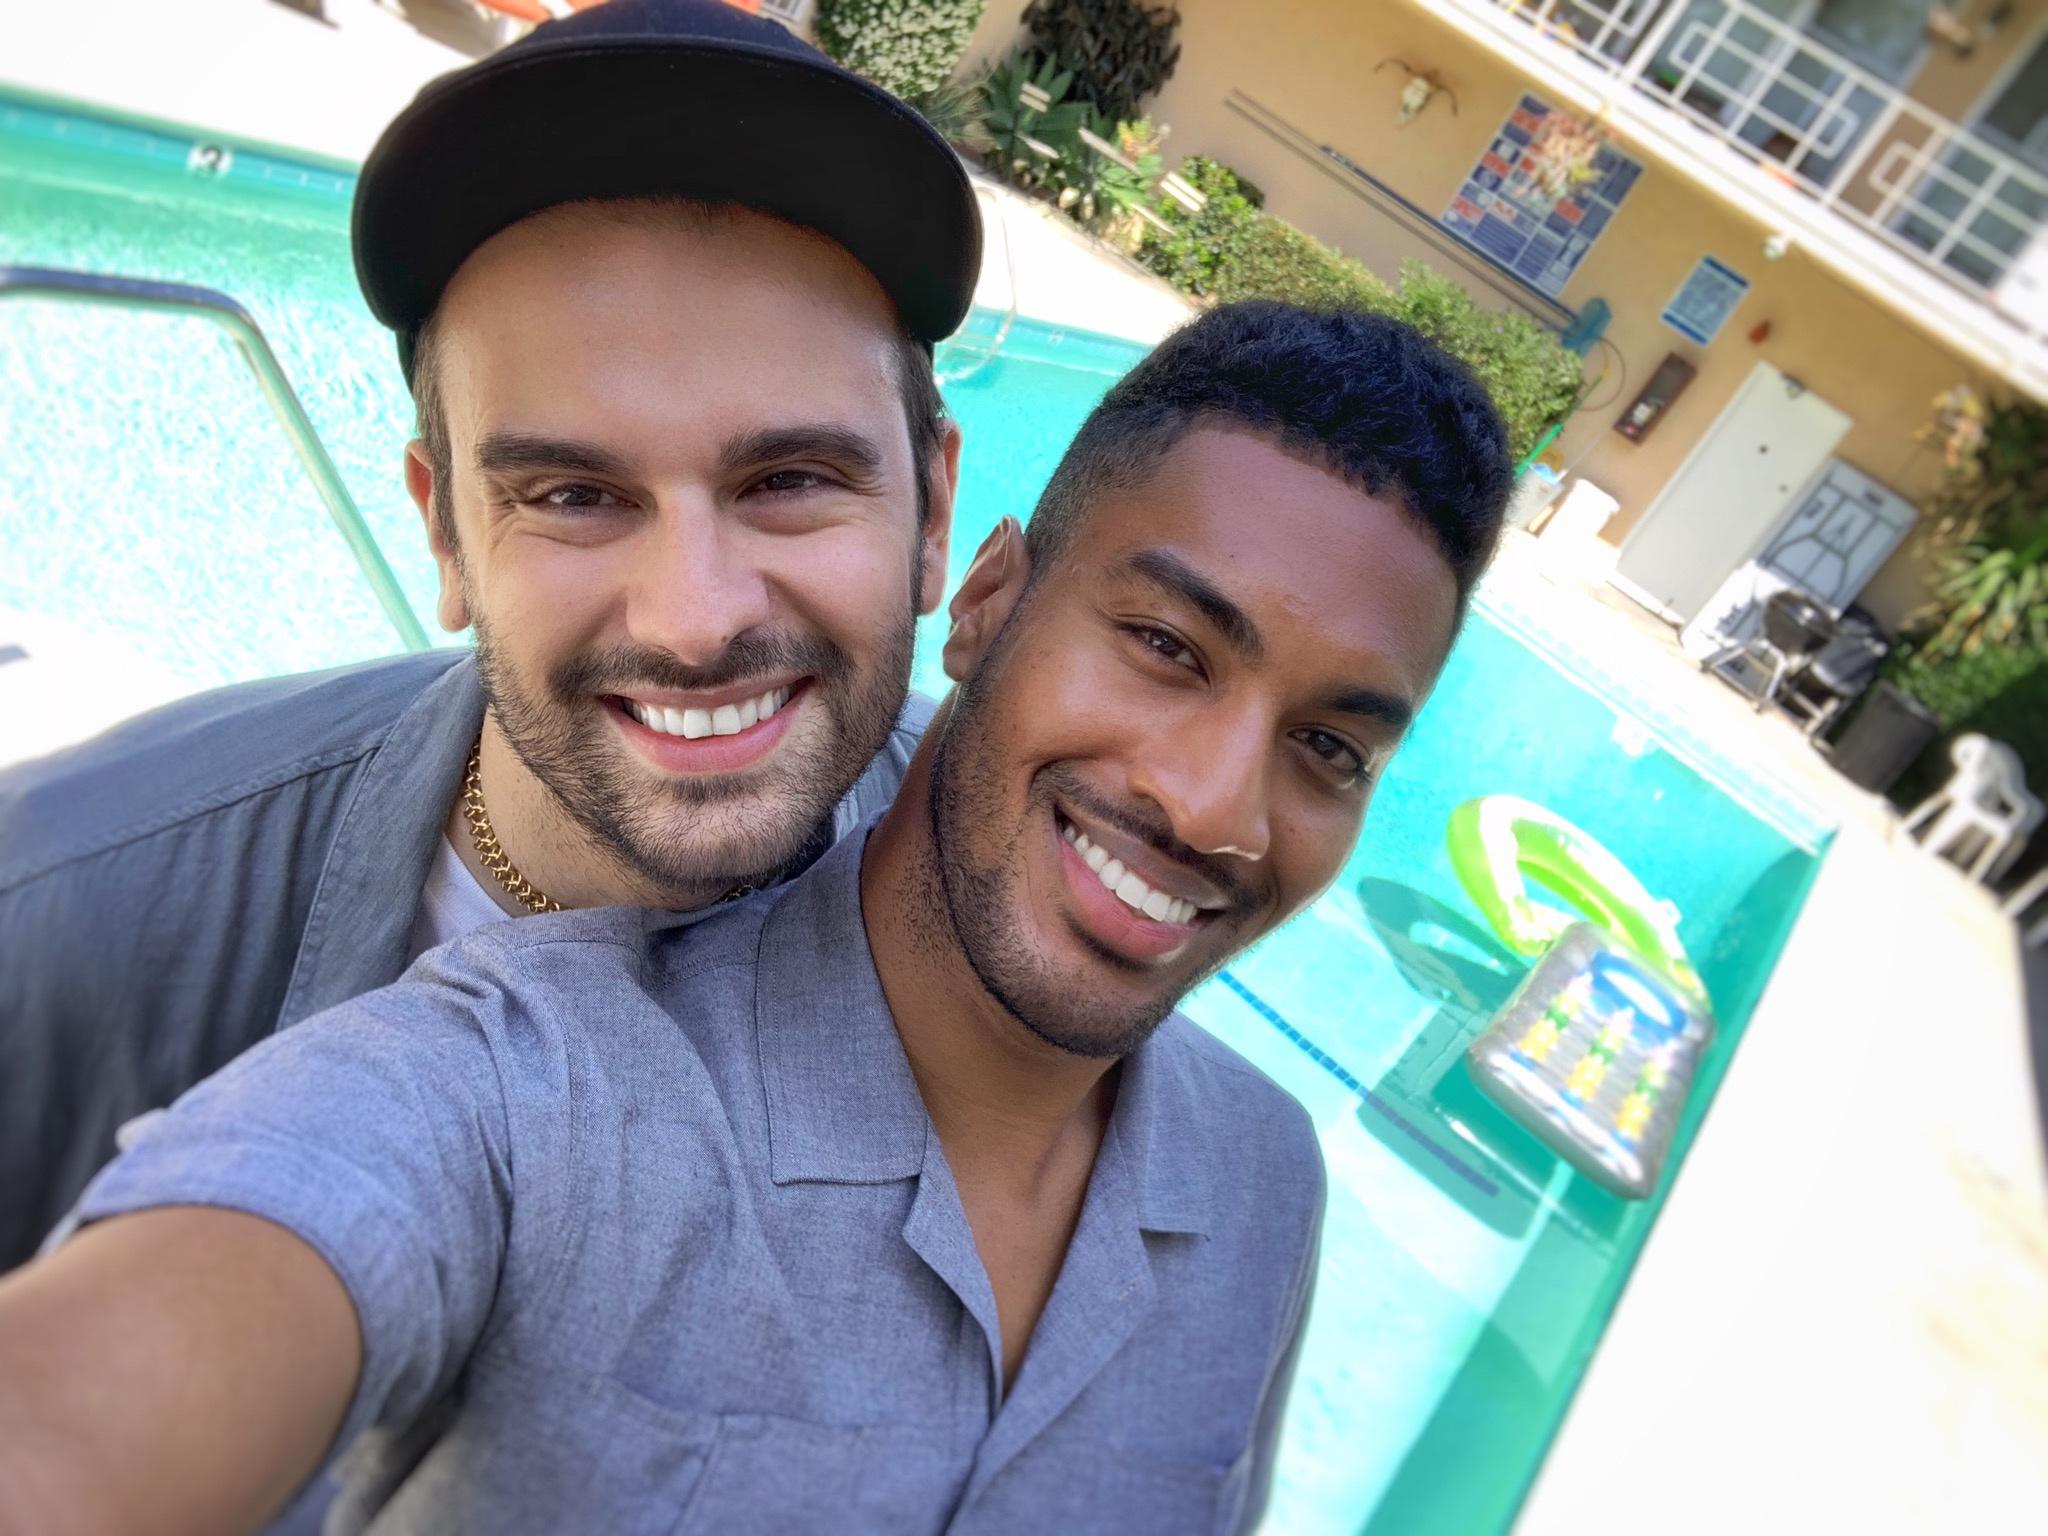 Amir and Jahan